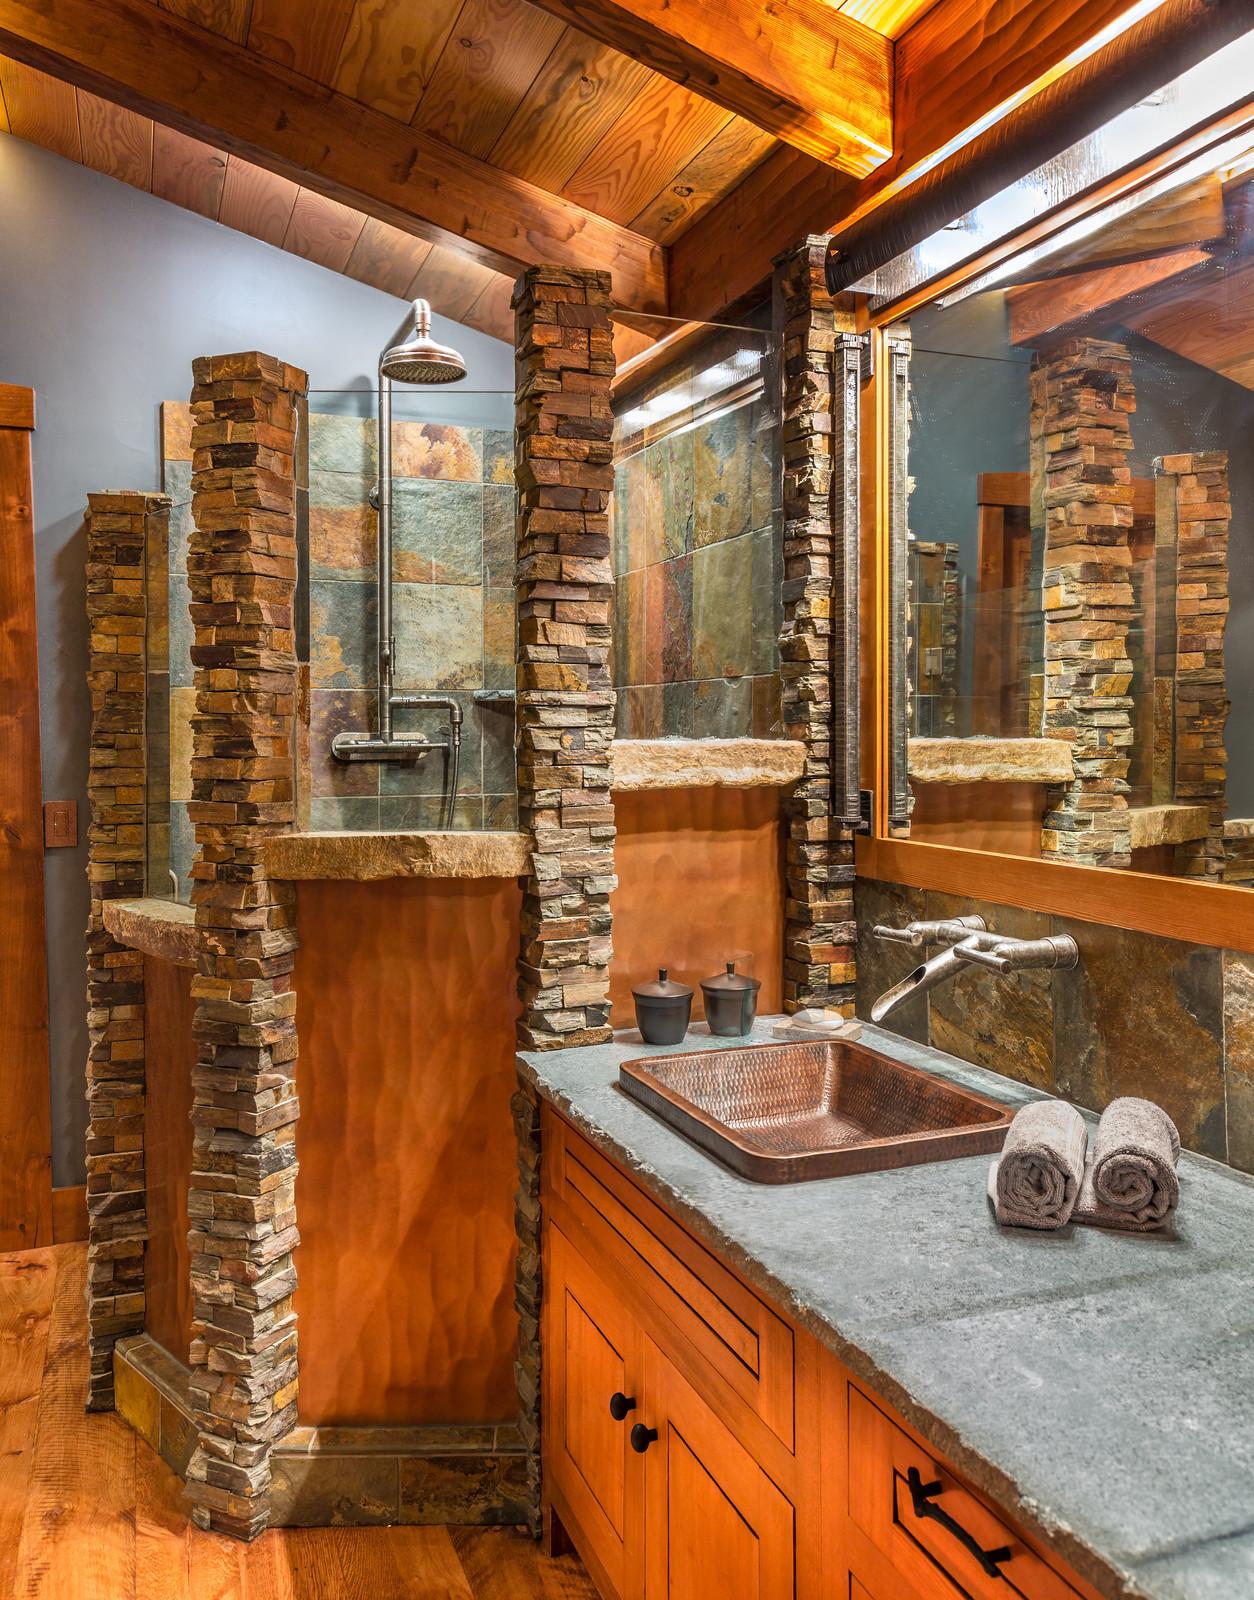 16 Fantastic Rustic Bathroom Designs That Will Take Your ... on Bathroom Remodel Design Ideas  id=74589